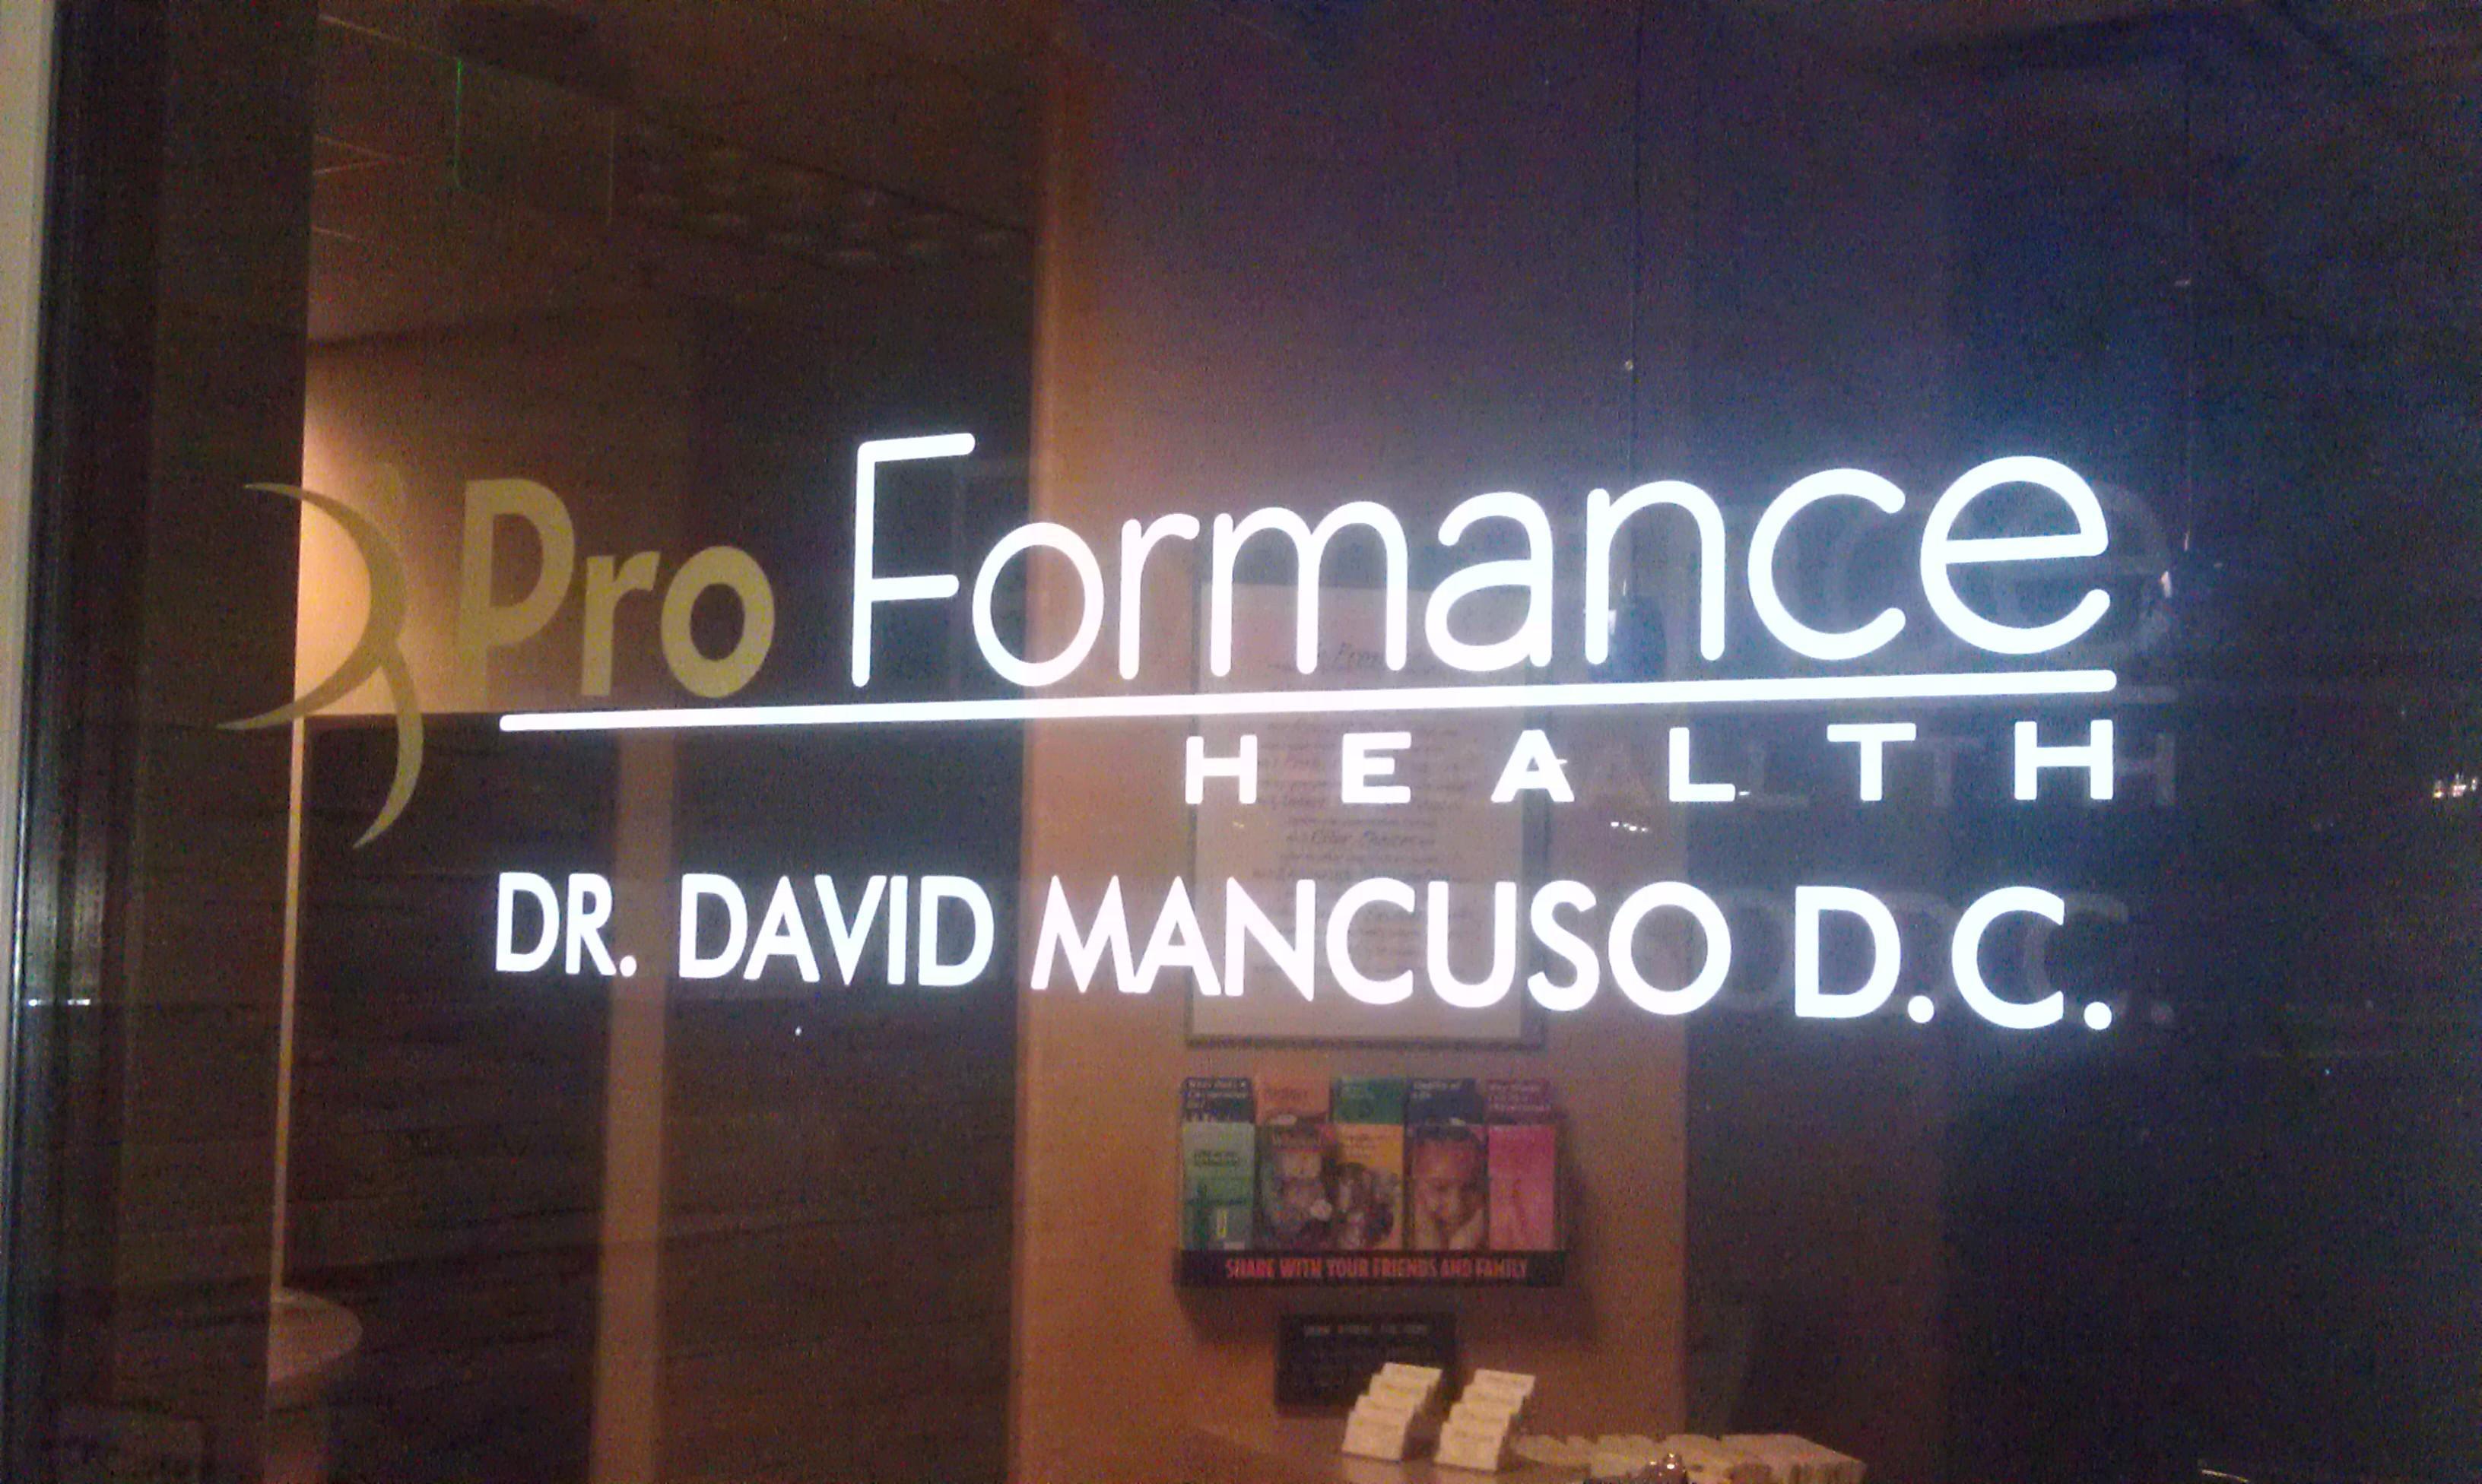 Proformance Health